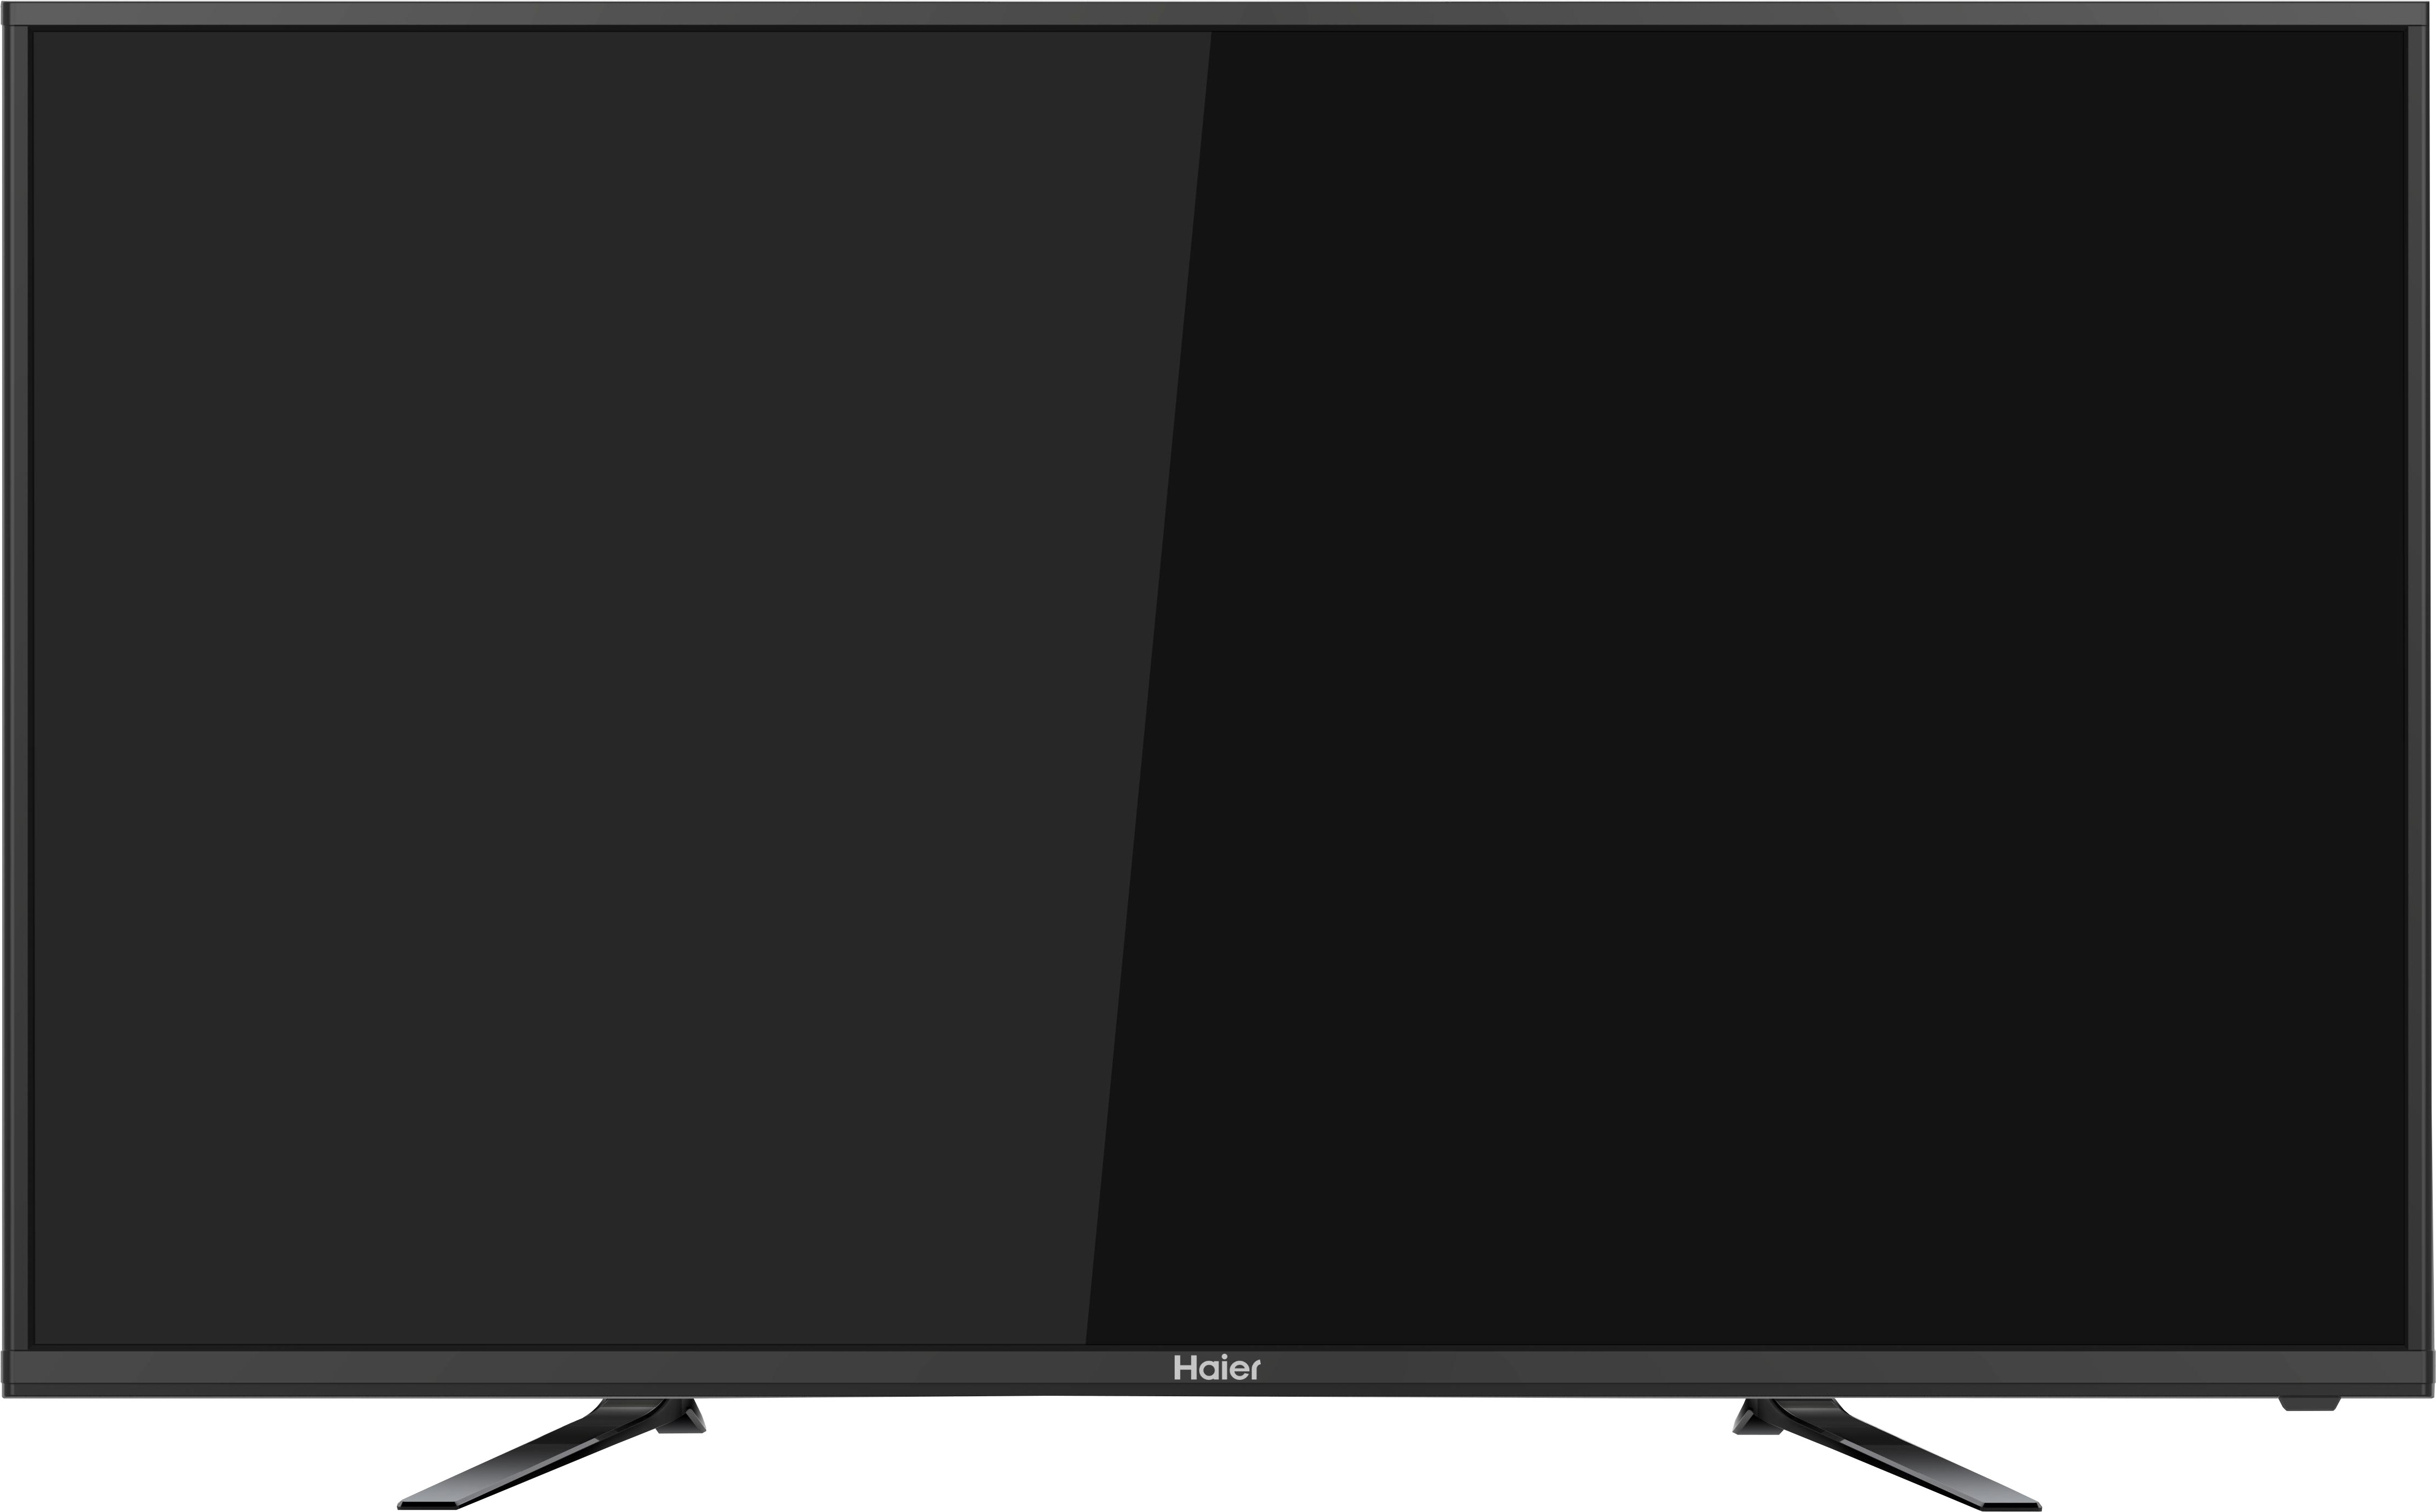 Haier LE24B8000 60 cm (23.6) LED TV